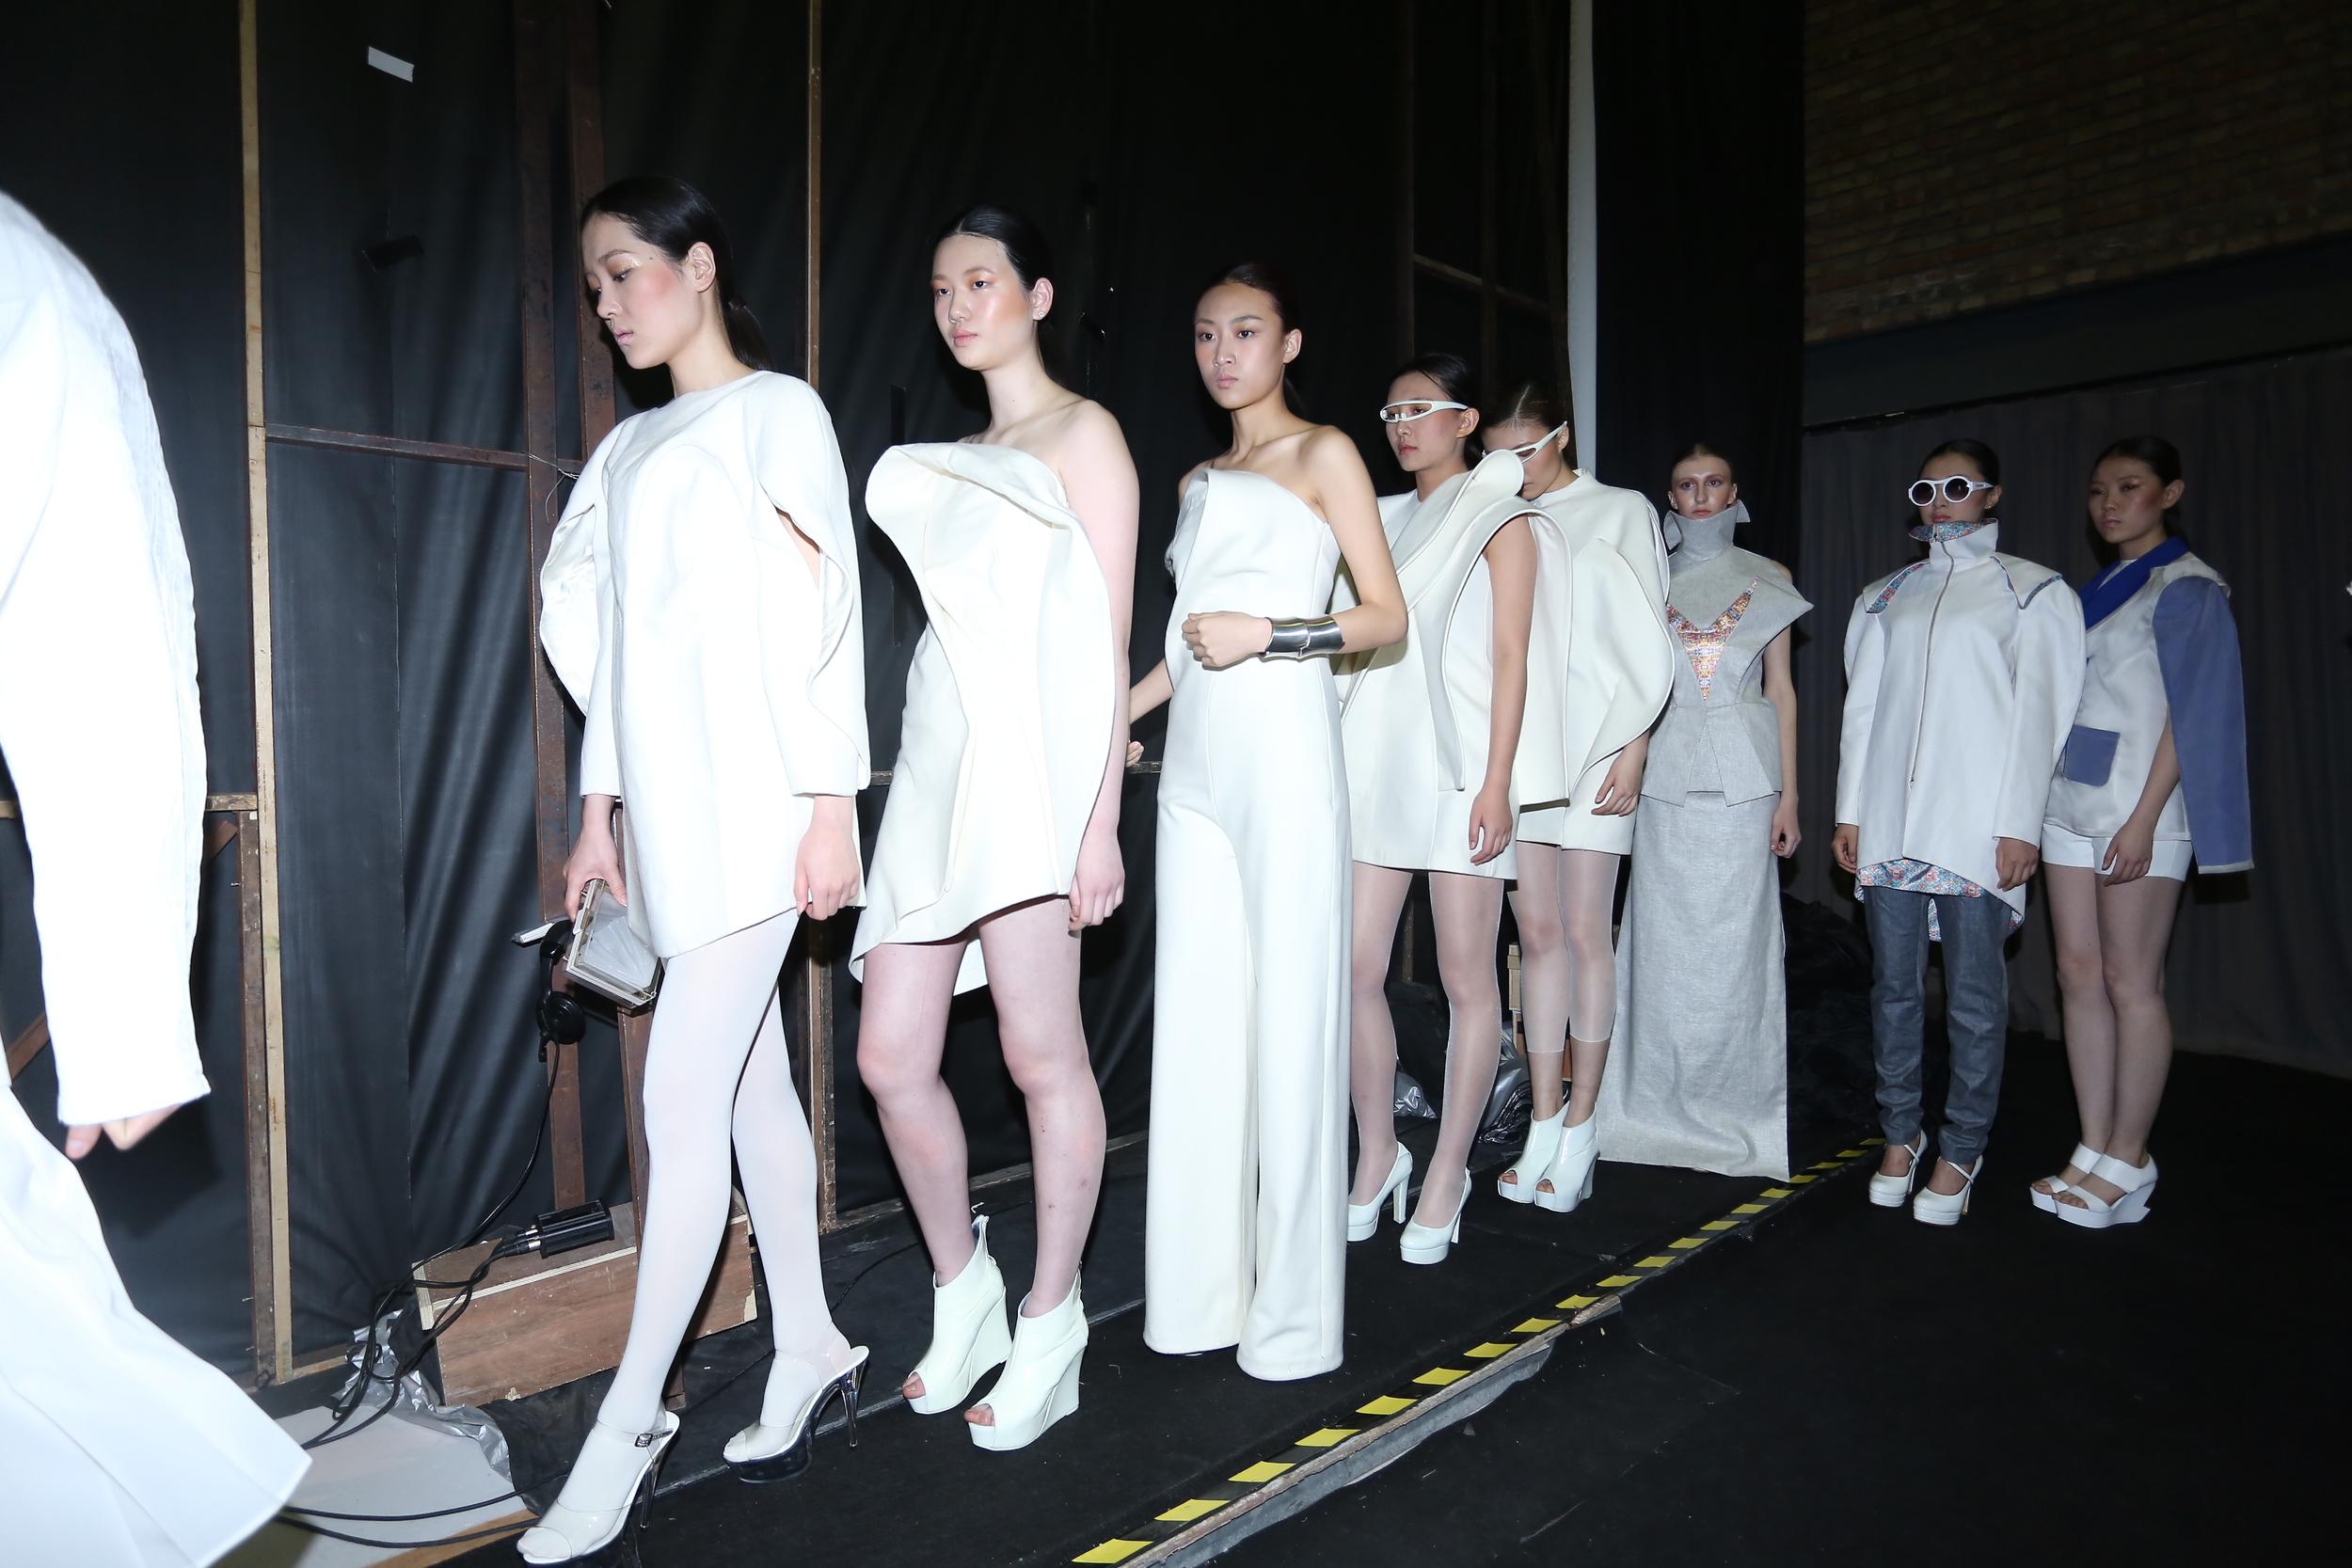 Tsinghua University's Academy of Arts & Design's graduation show